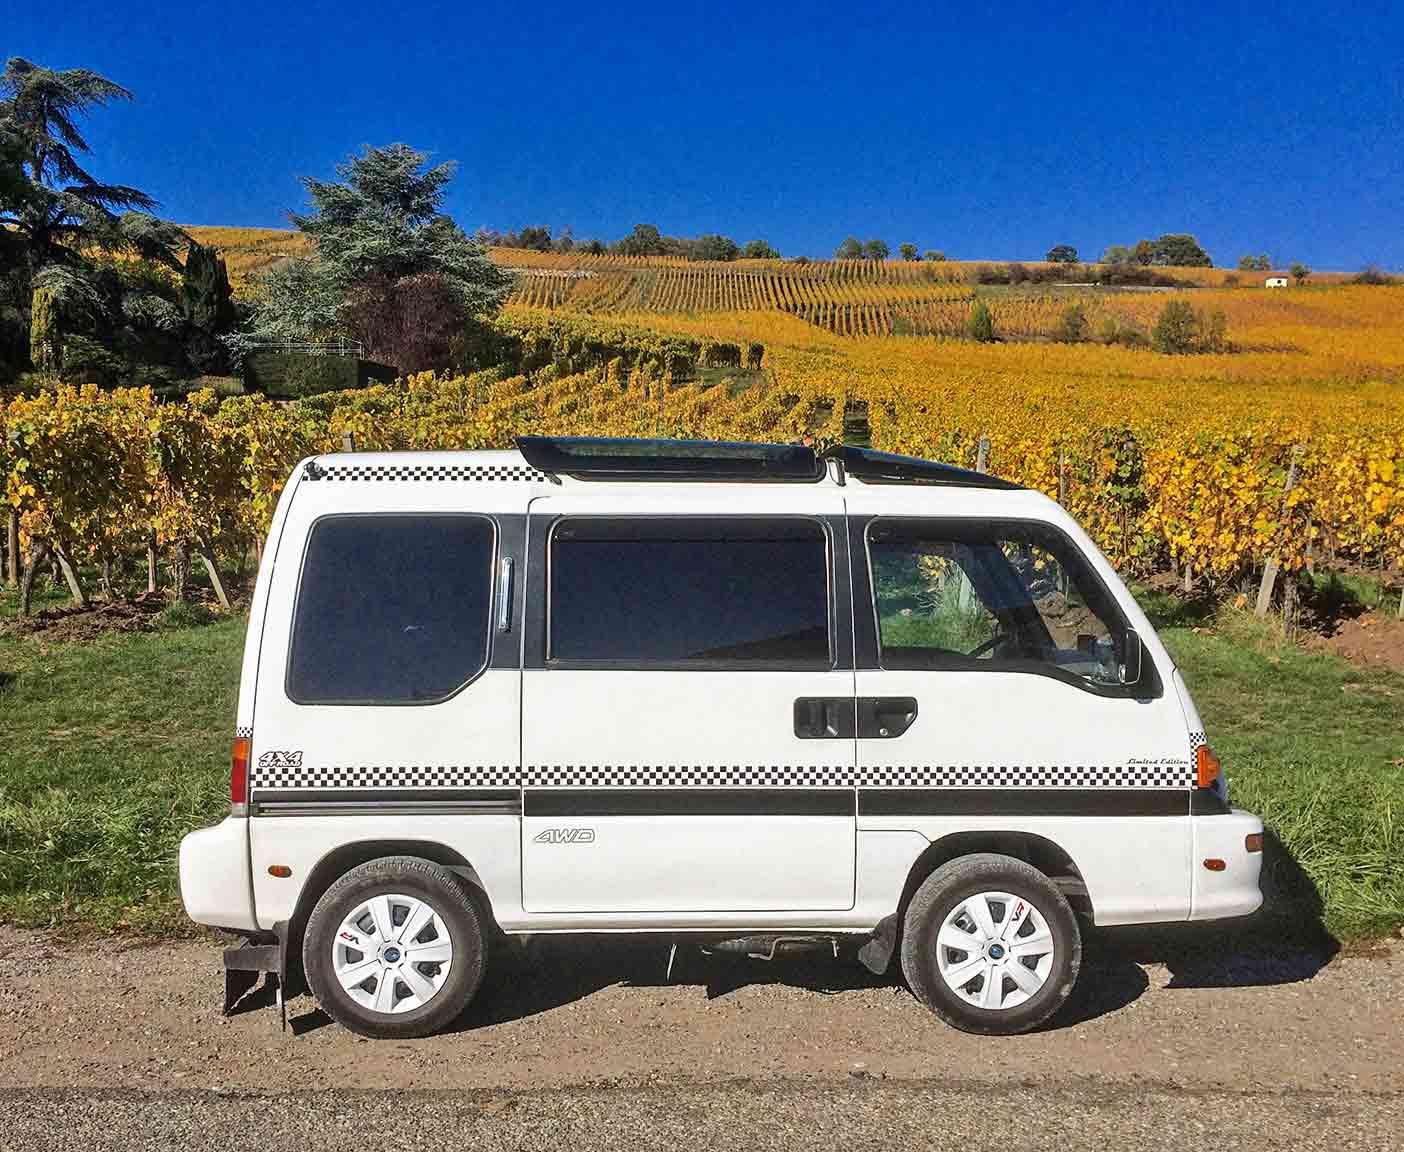 subaru-libero-wohnmobil-umbau-e10-4x4-allrad-camper-minicamper-daihatsu-hijet-piaggio-porter-99